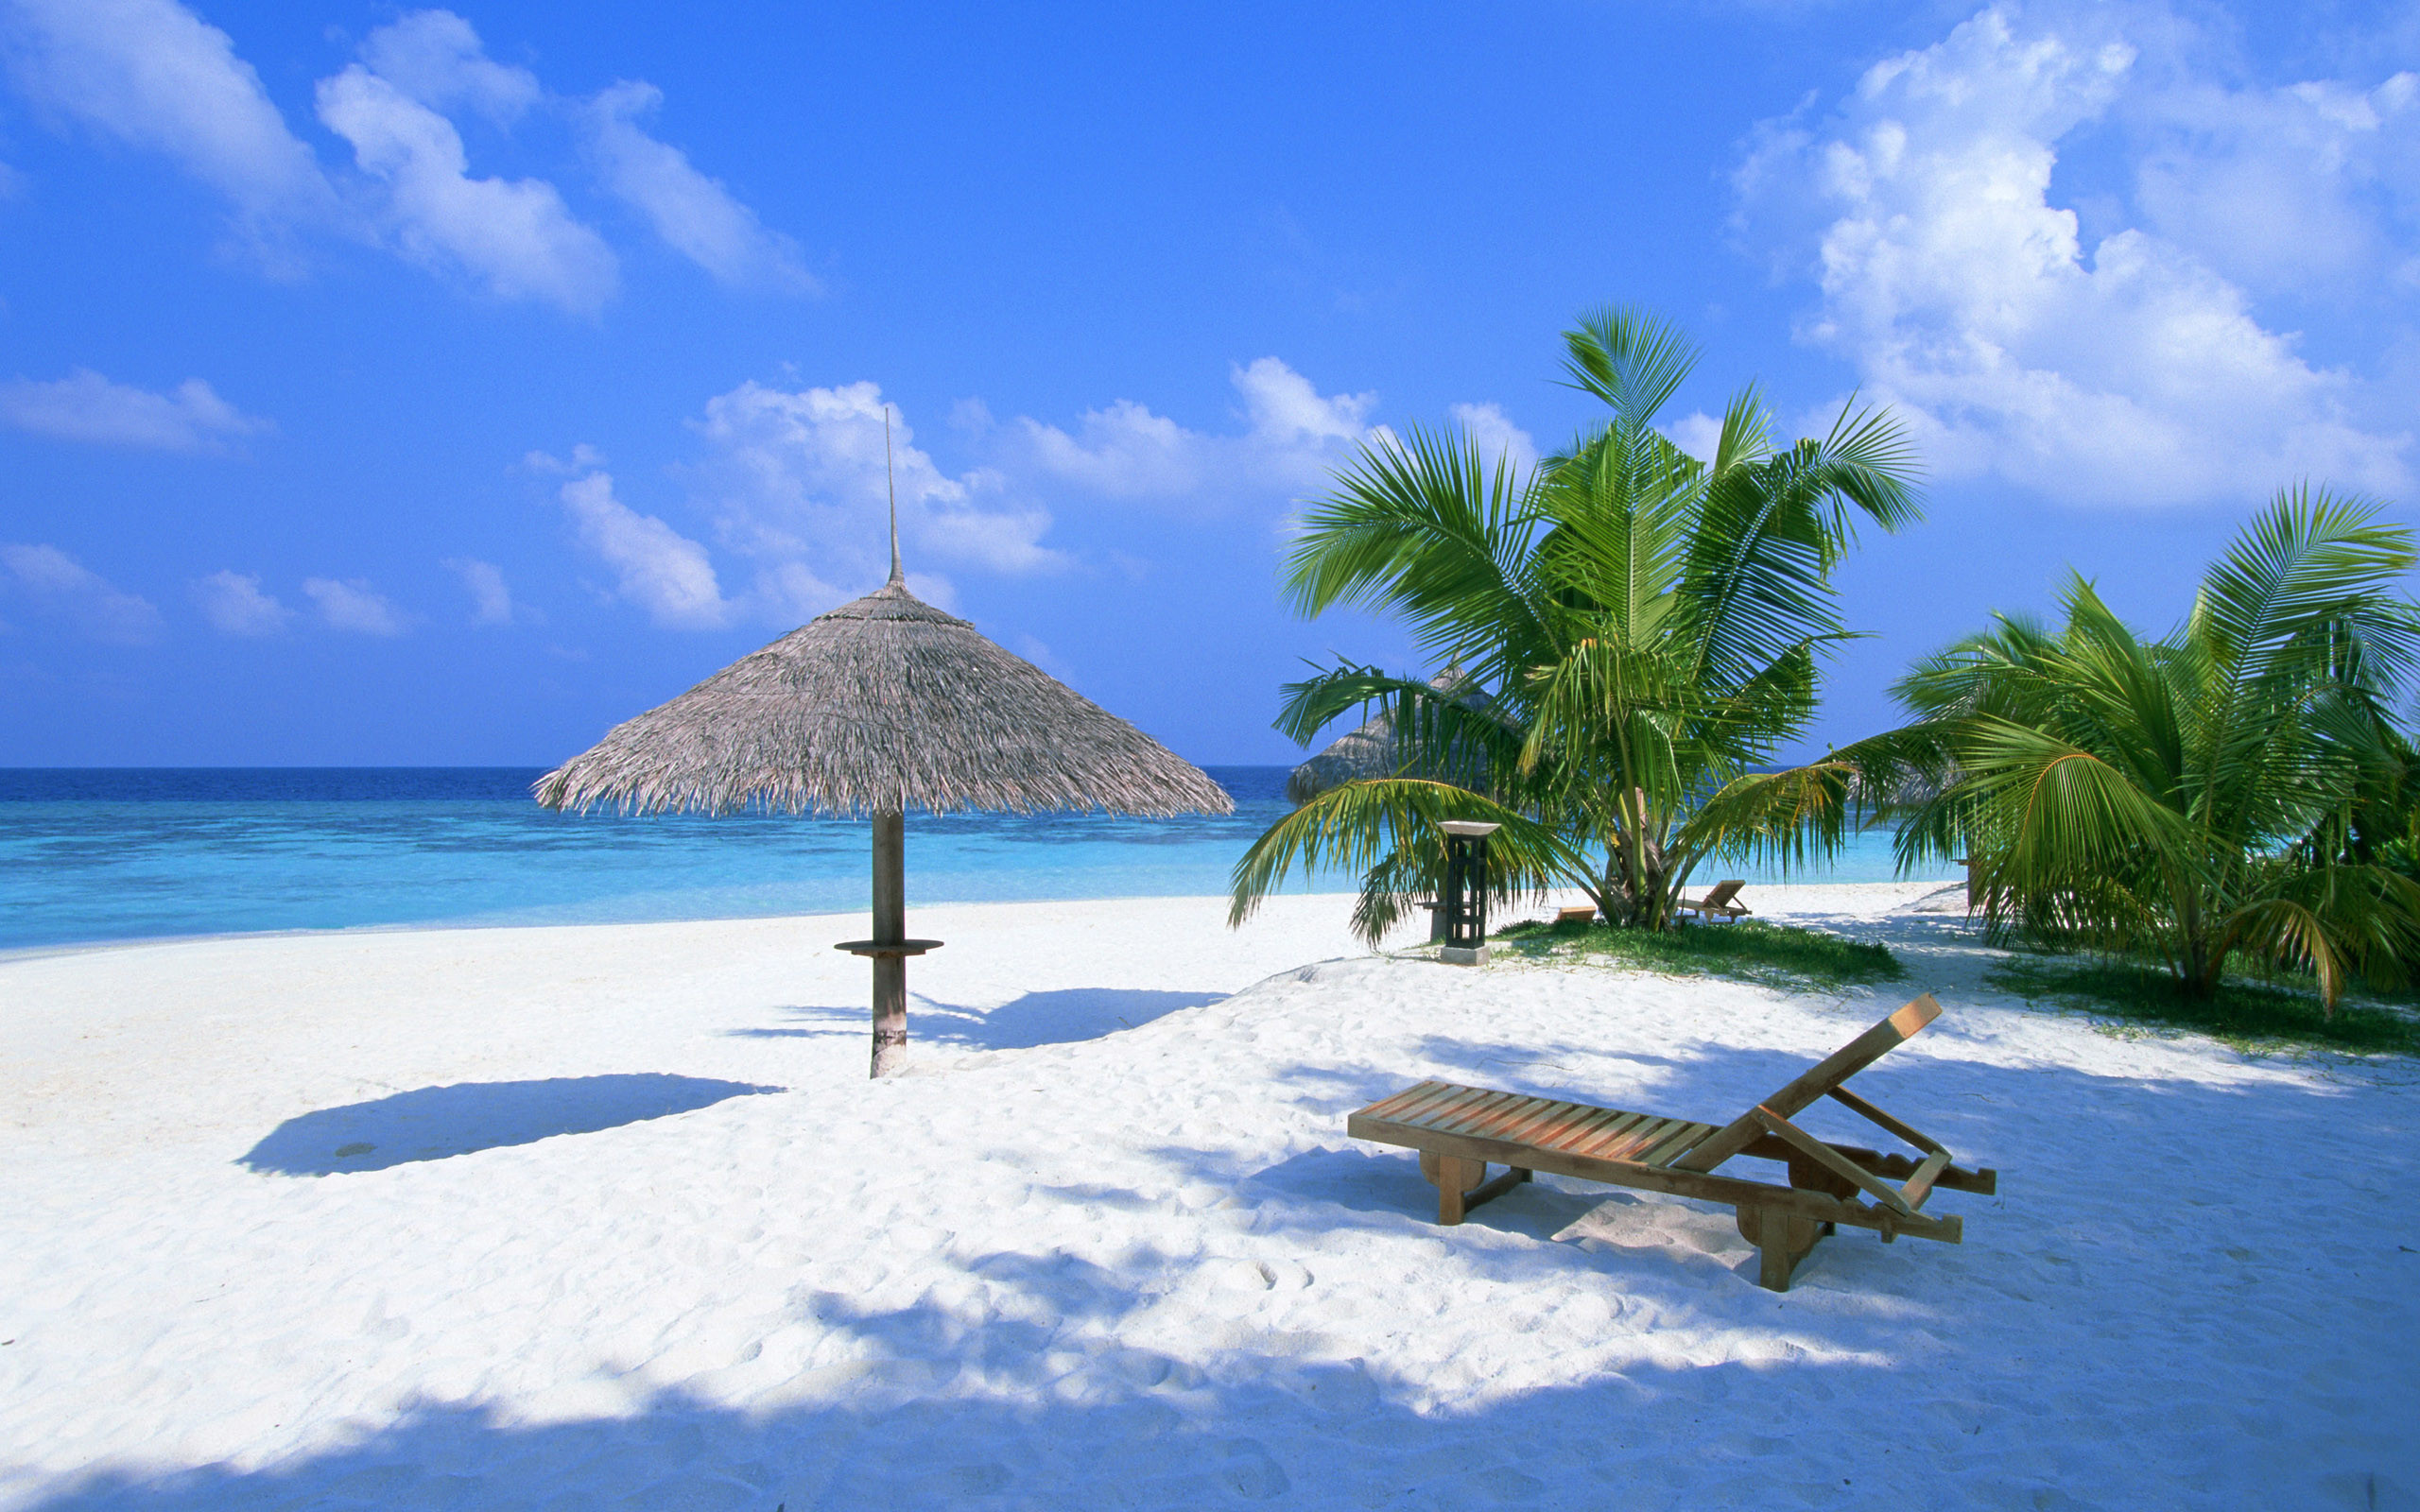 Maldives Island Desktop Backgrounds | Free Maldives Island Desktop .